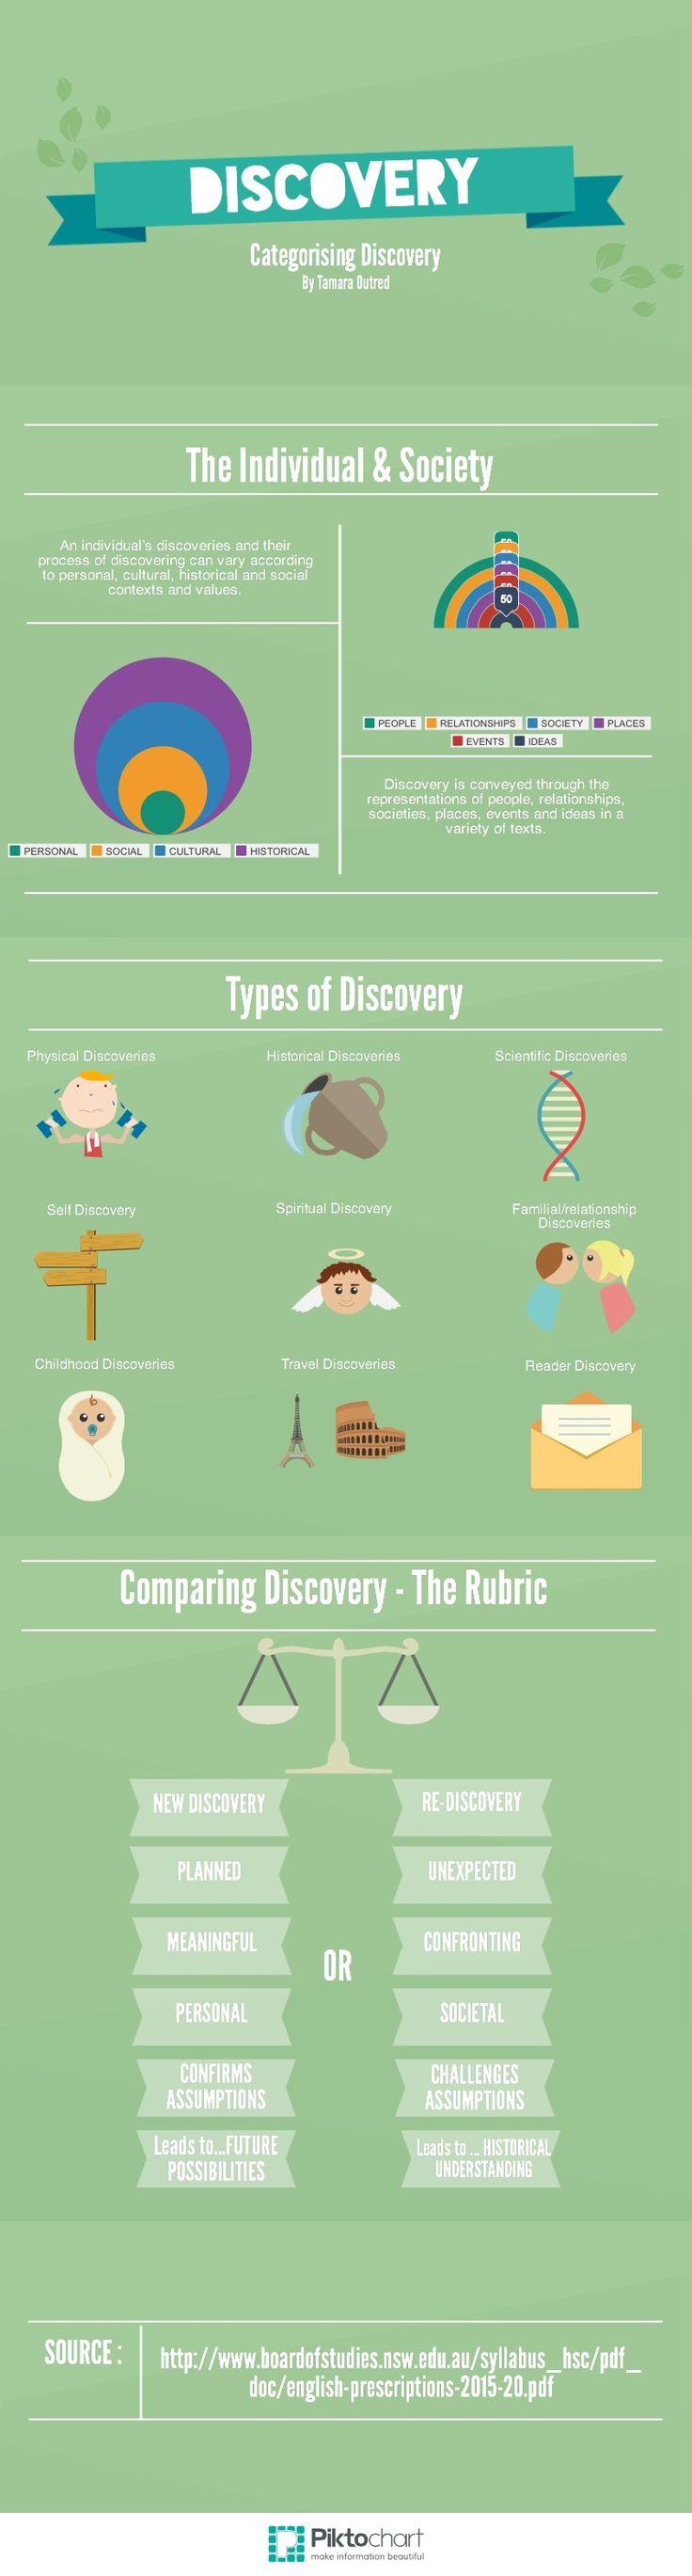 Categorising Discovery